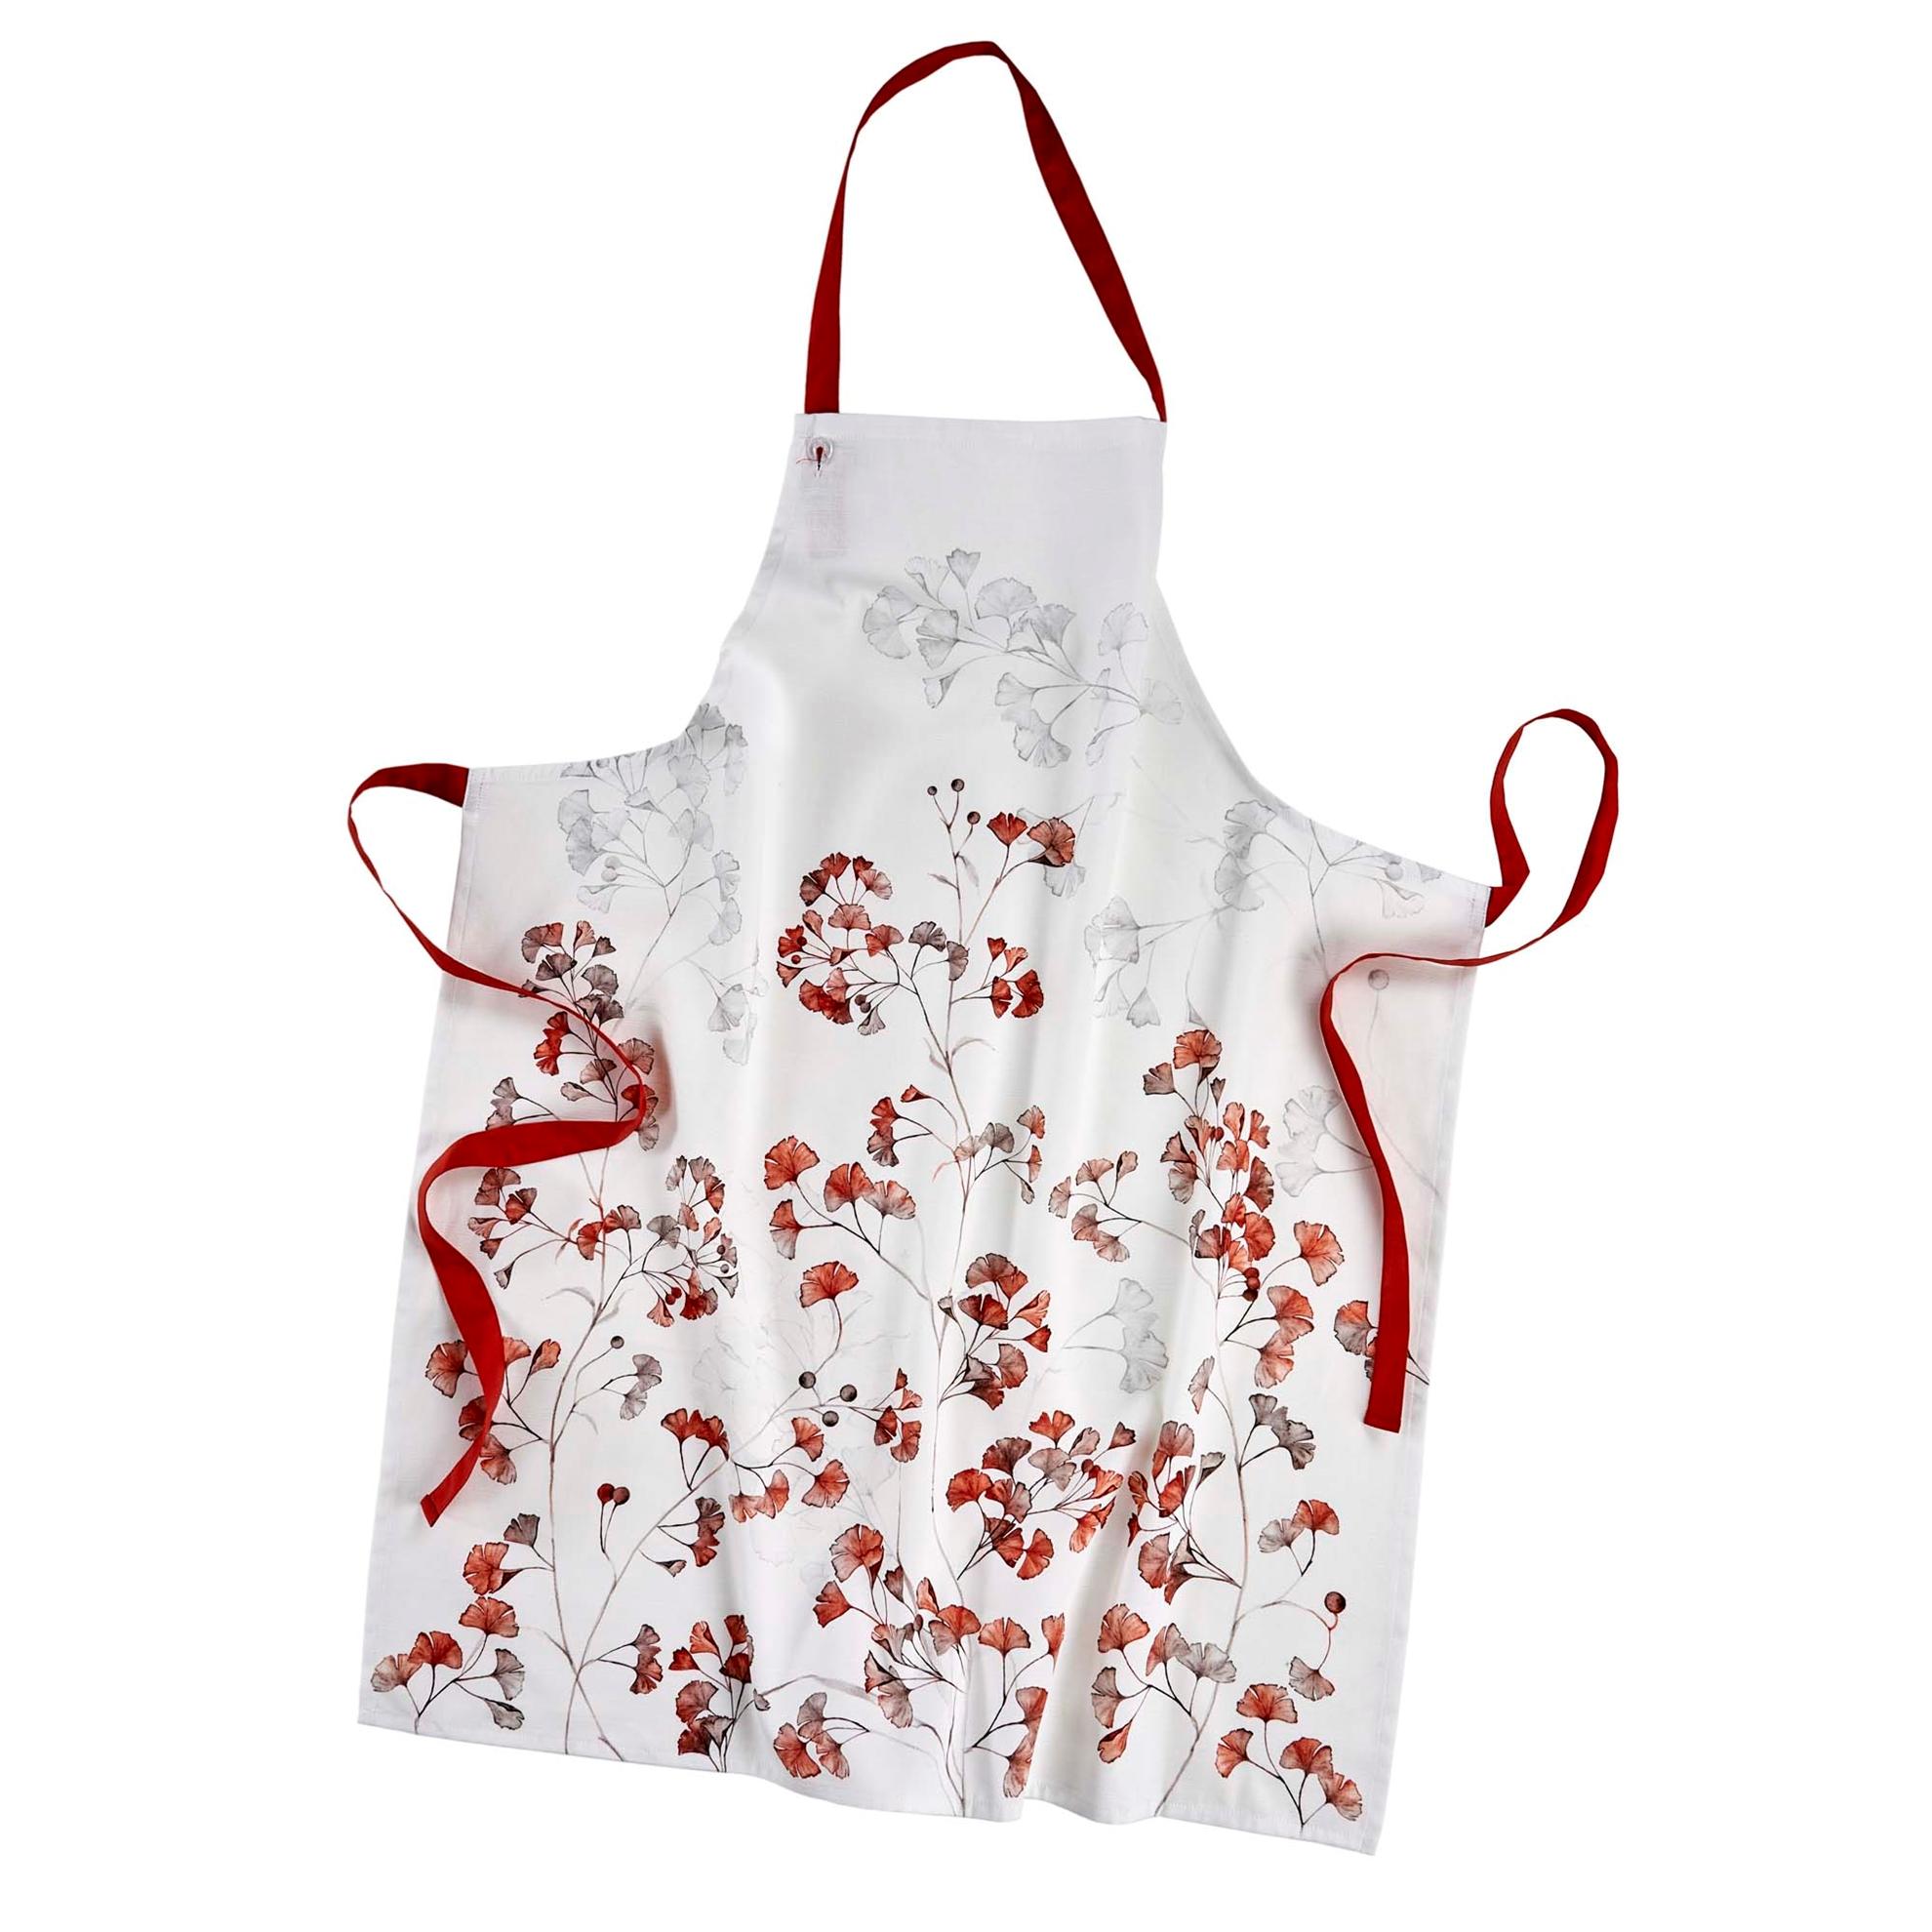 resm Taç Boutique Rosia Mutfak Önlüğü